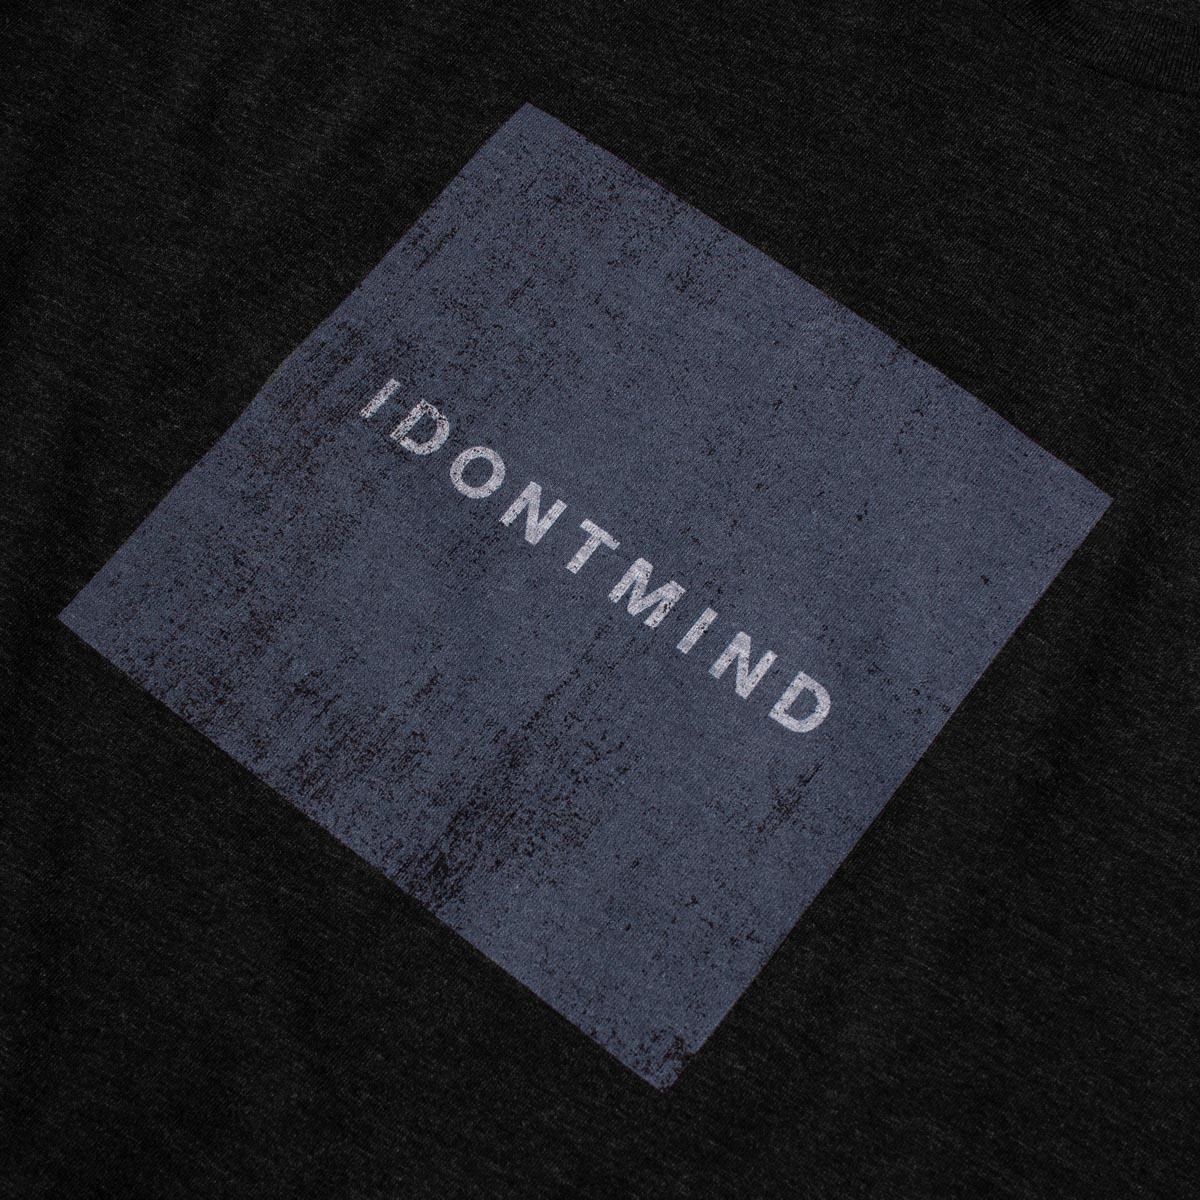 IDONTMIND-Vintage-Square-Tee-Black-Detail.jpg